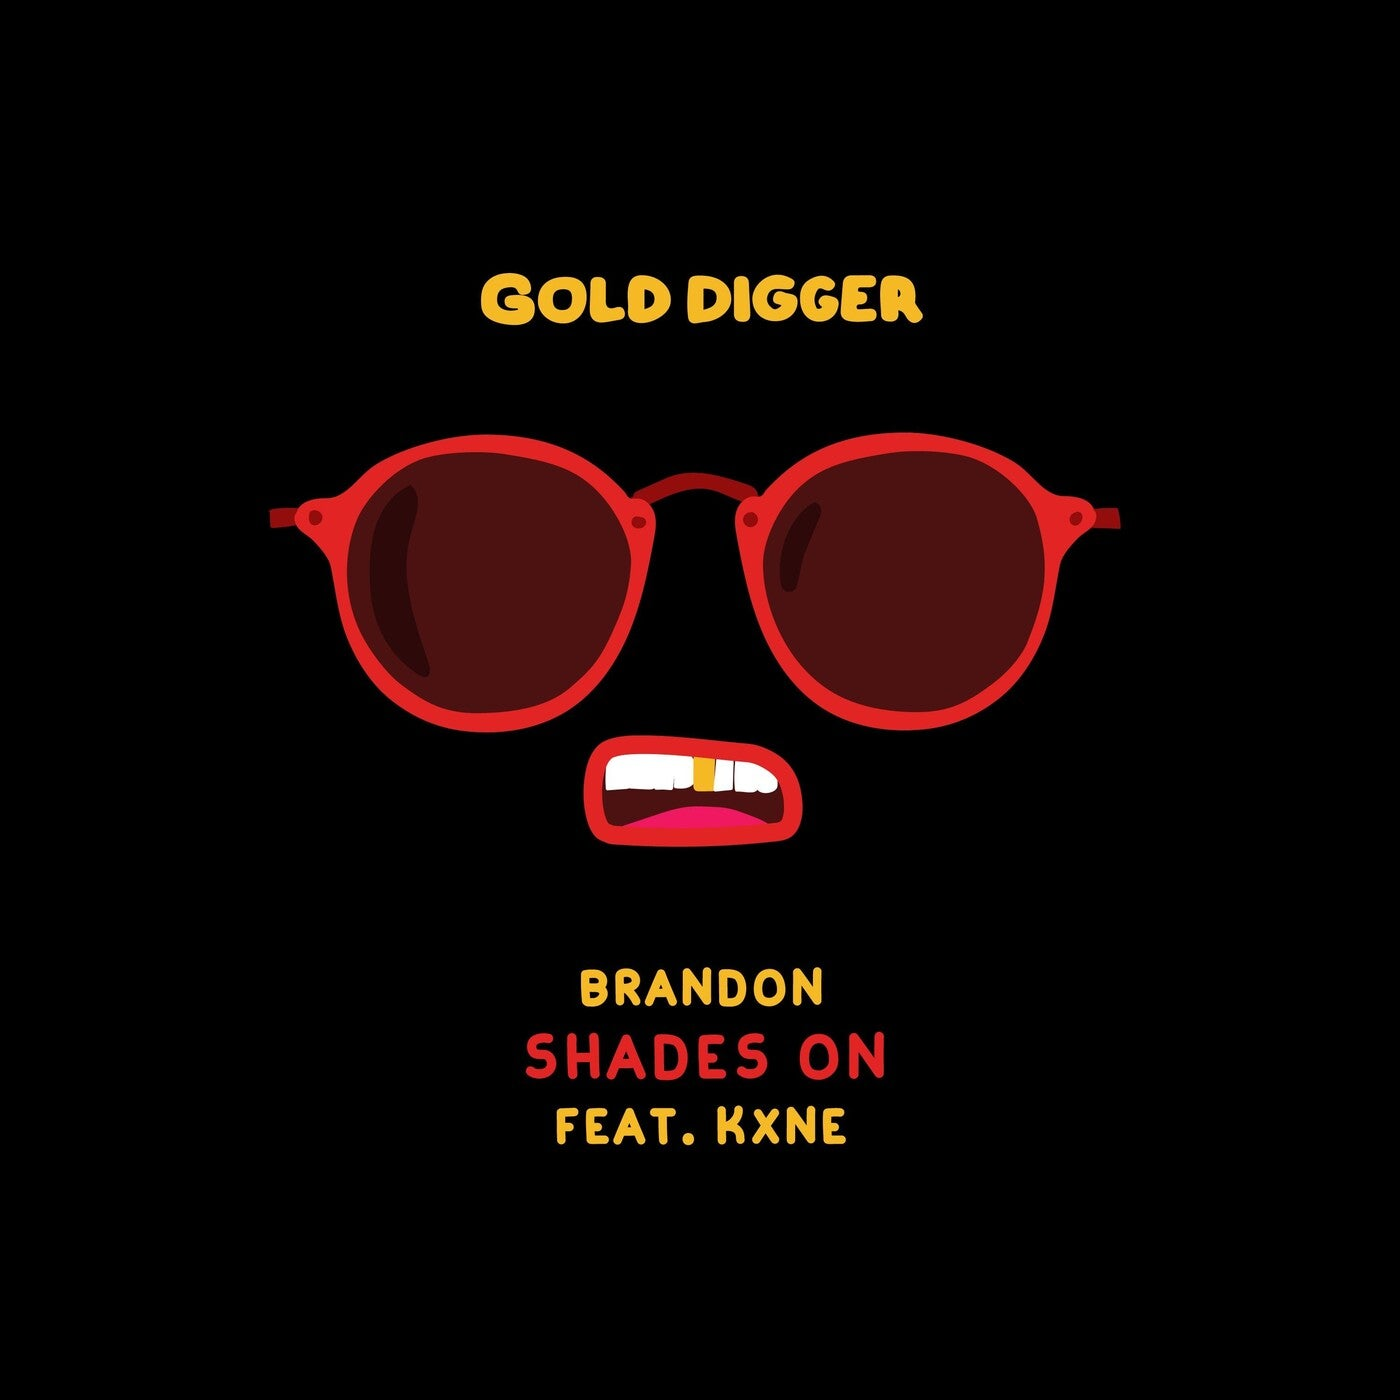 Shades On feat. Kxne (Original Mix)